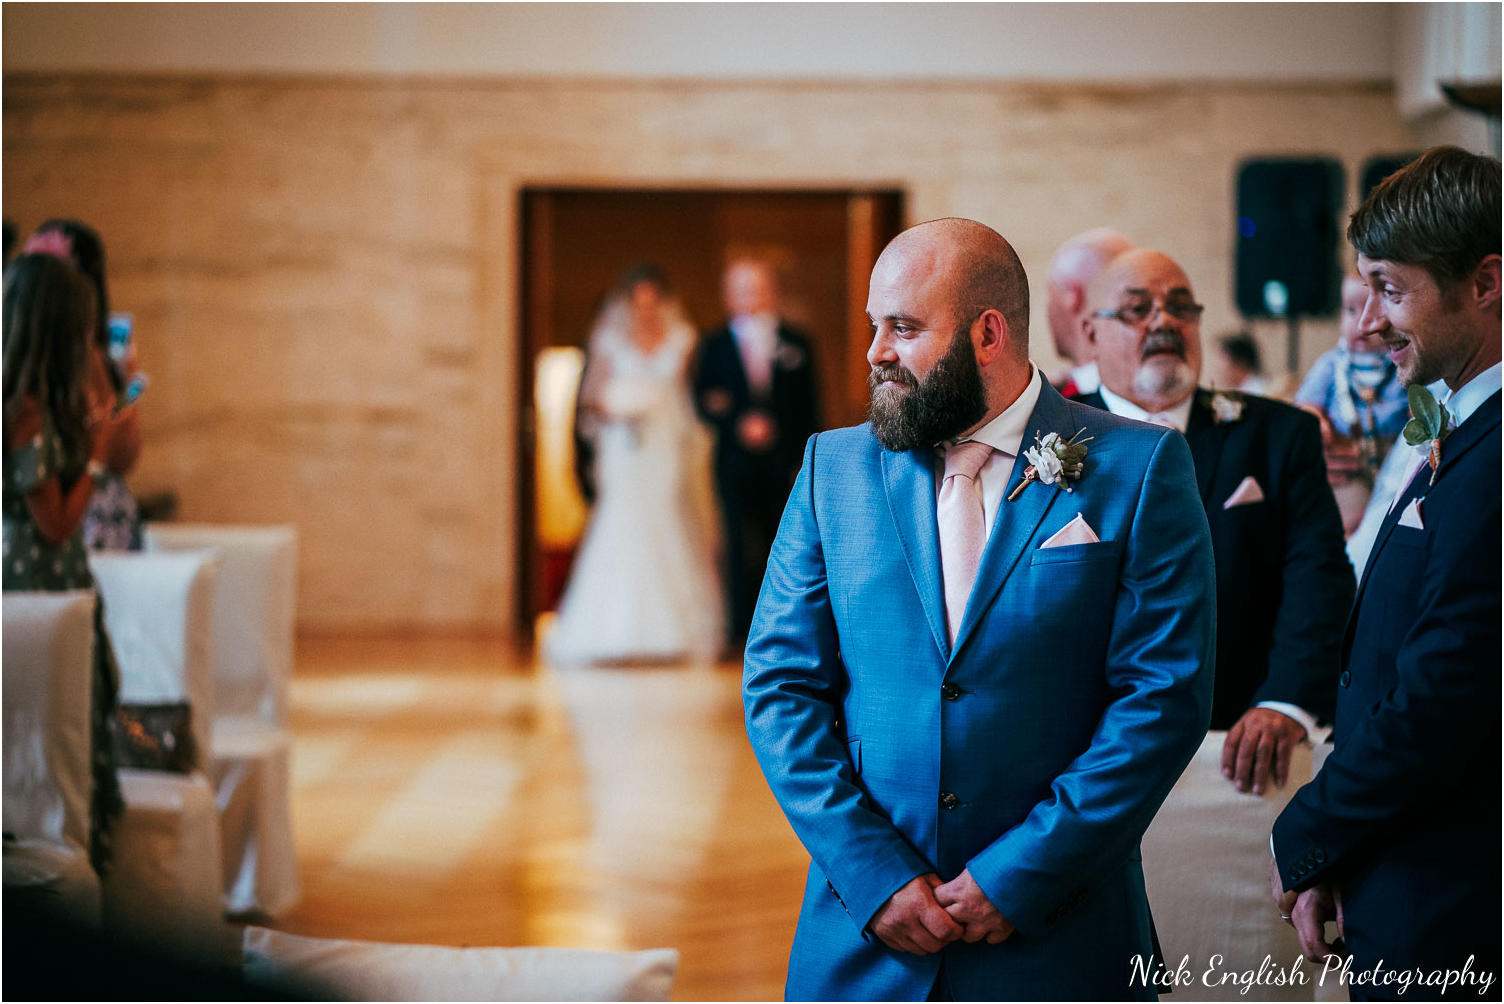 Destination_Wedding_Photographer_Slovenia_Nick_English_Photography-35.jpg